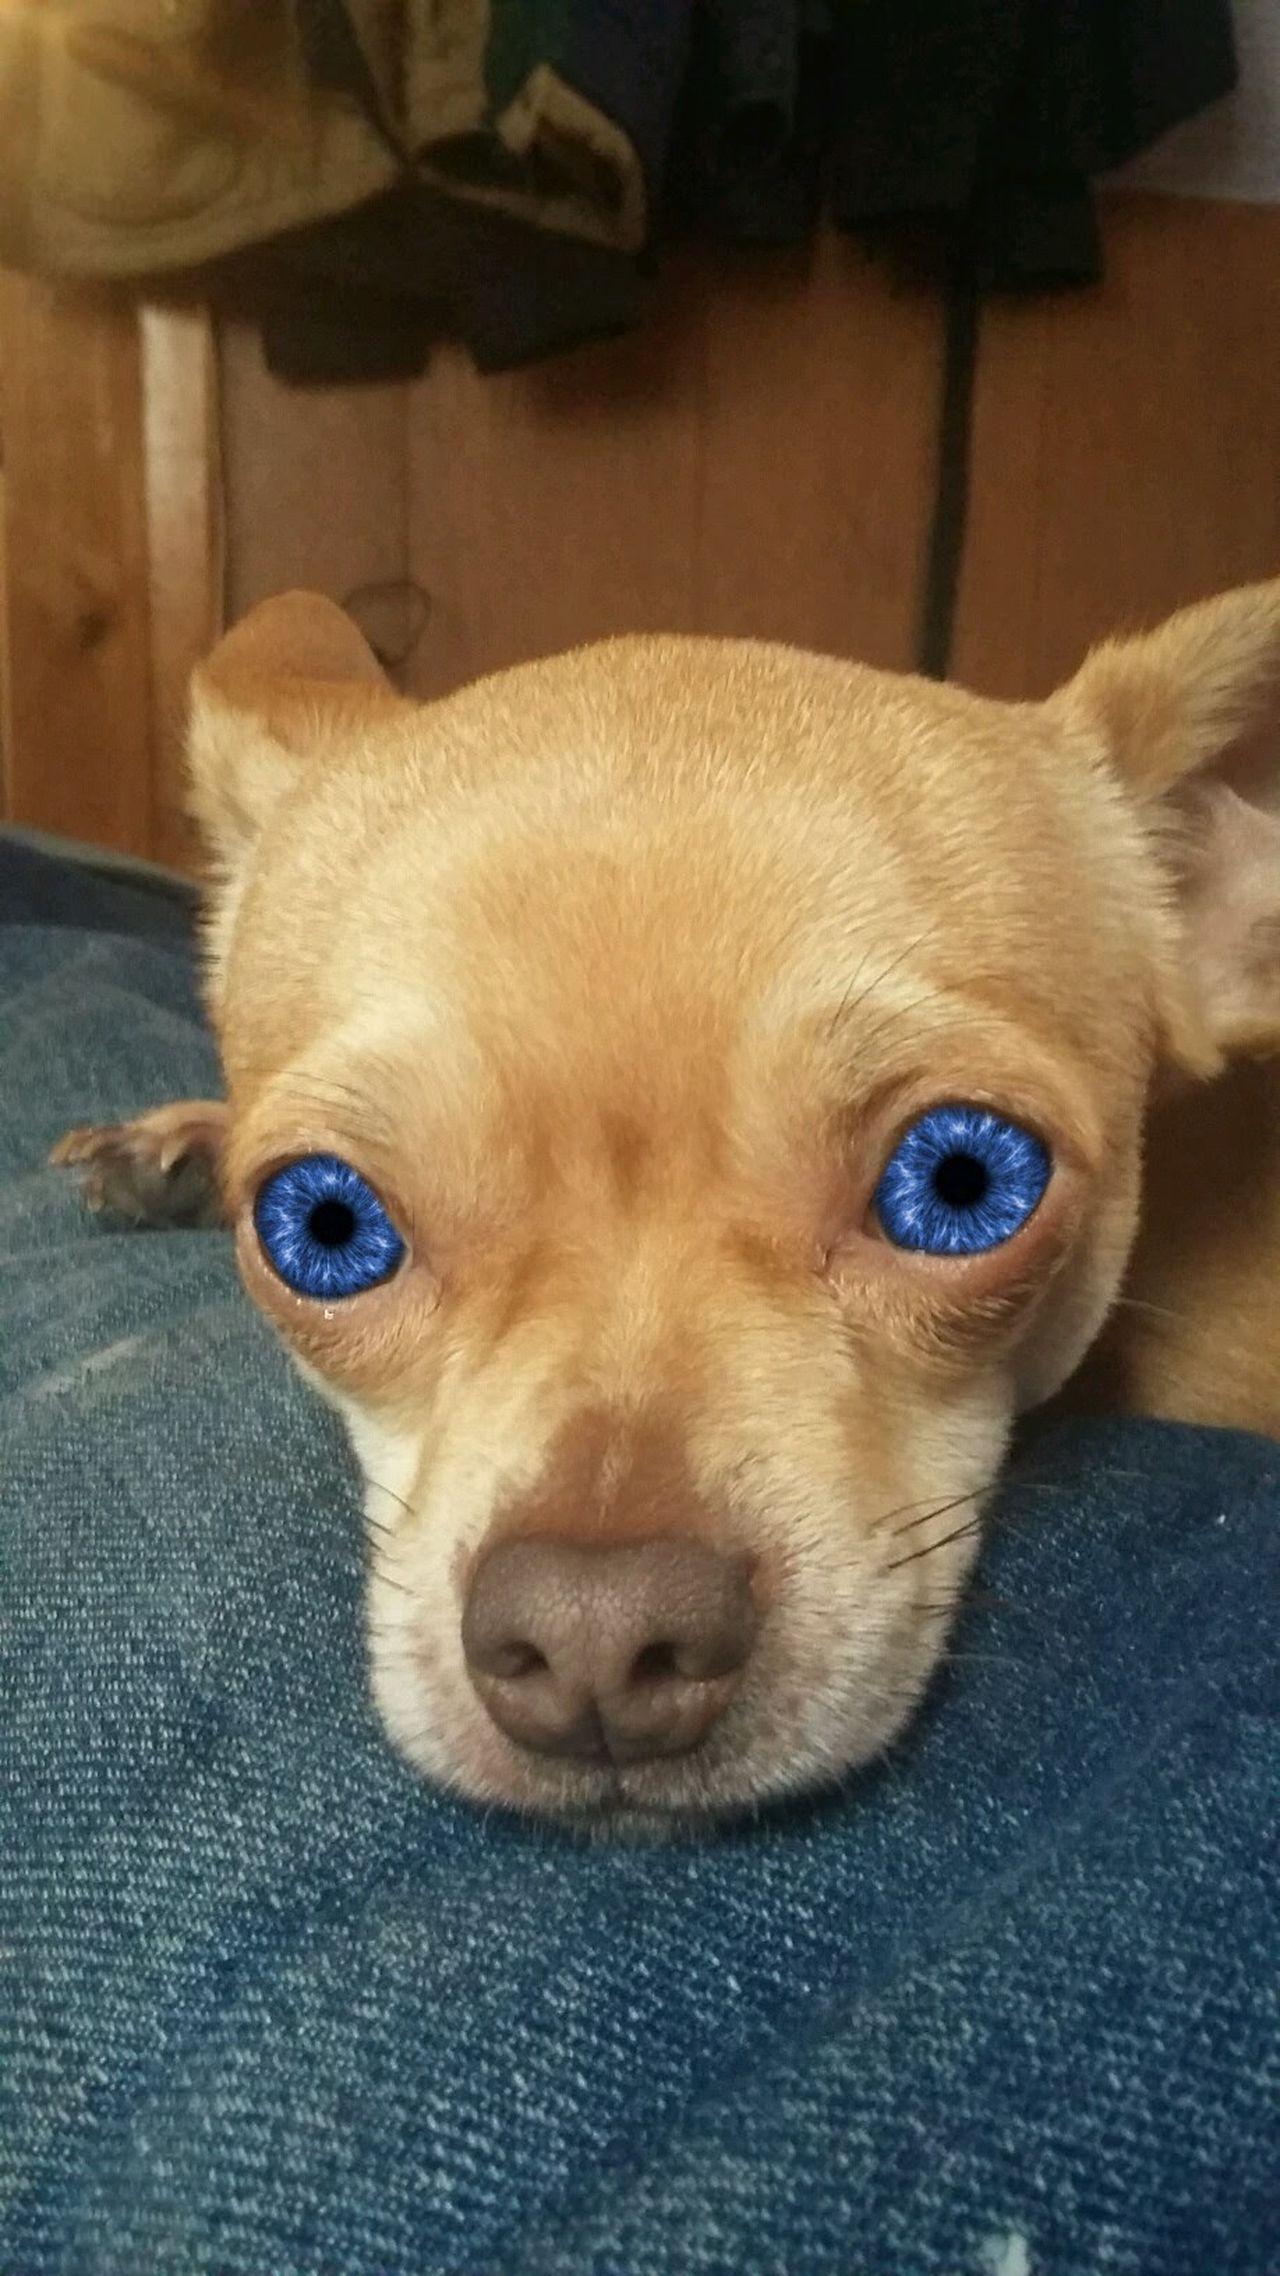 Chihuahua pet dog Animal Themes Dog Pets Small Animal Dog❤ Dog Life Dog Lover Doggy Love